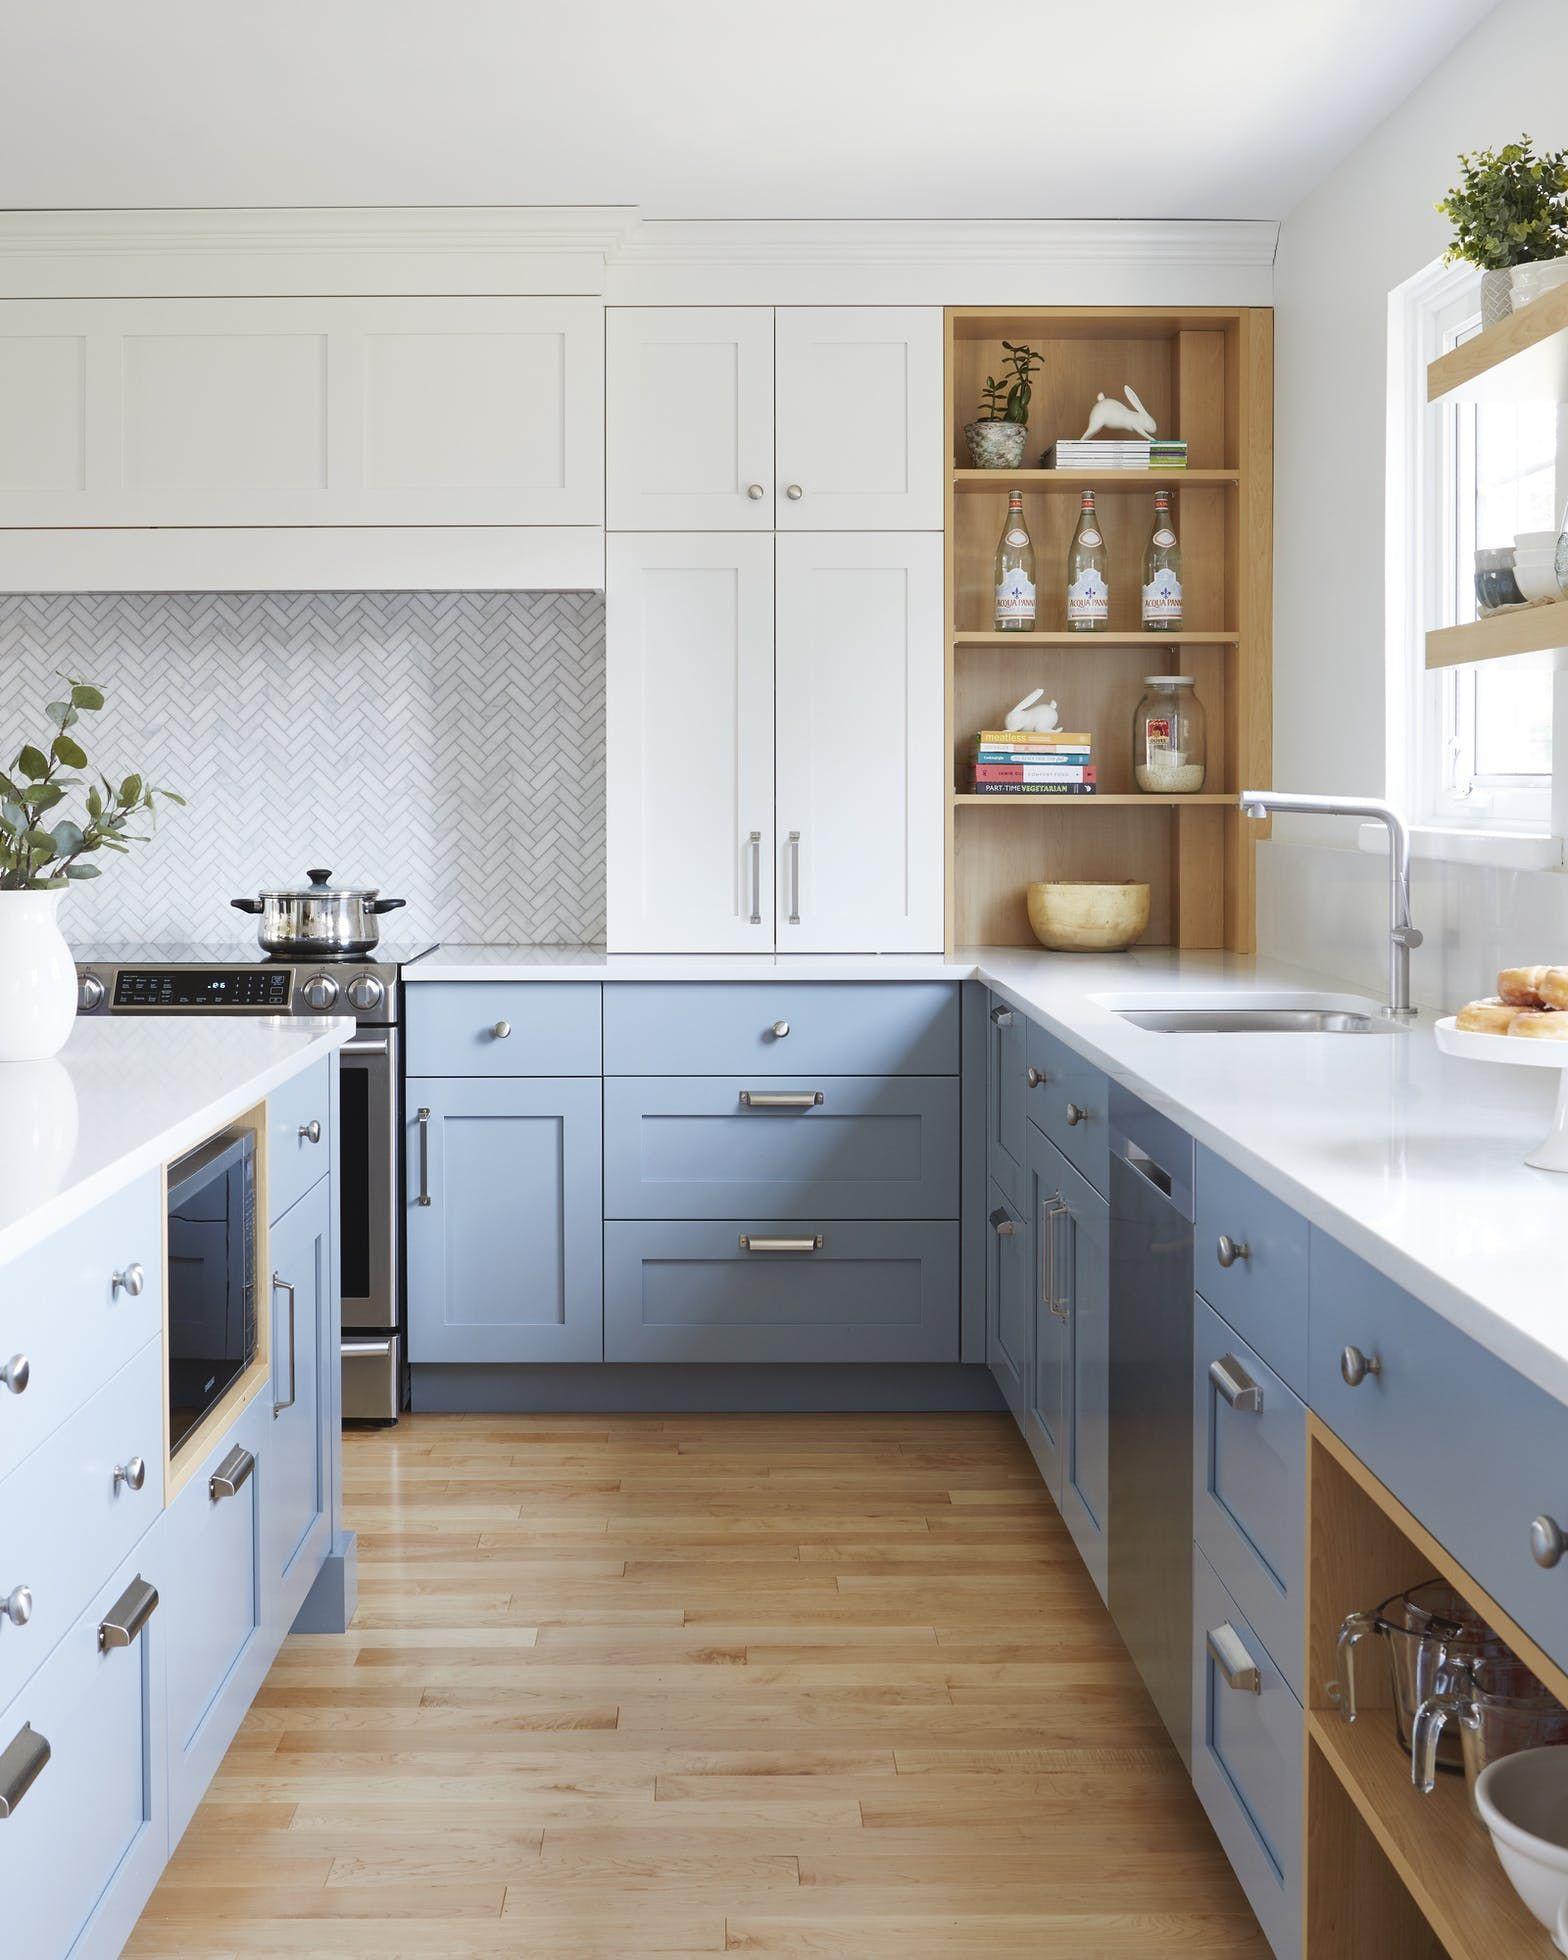 Silestone Drimmie Kitchen By Cosentino In 2020 Pastell Kuche Kuche Farbideen Kuchendesign